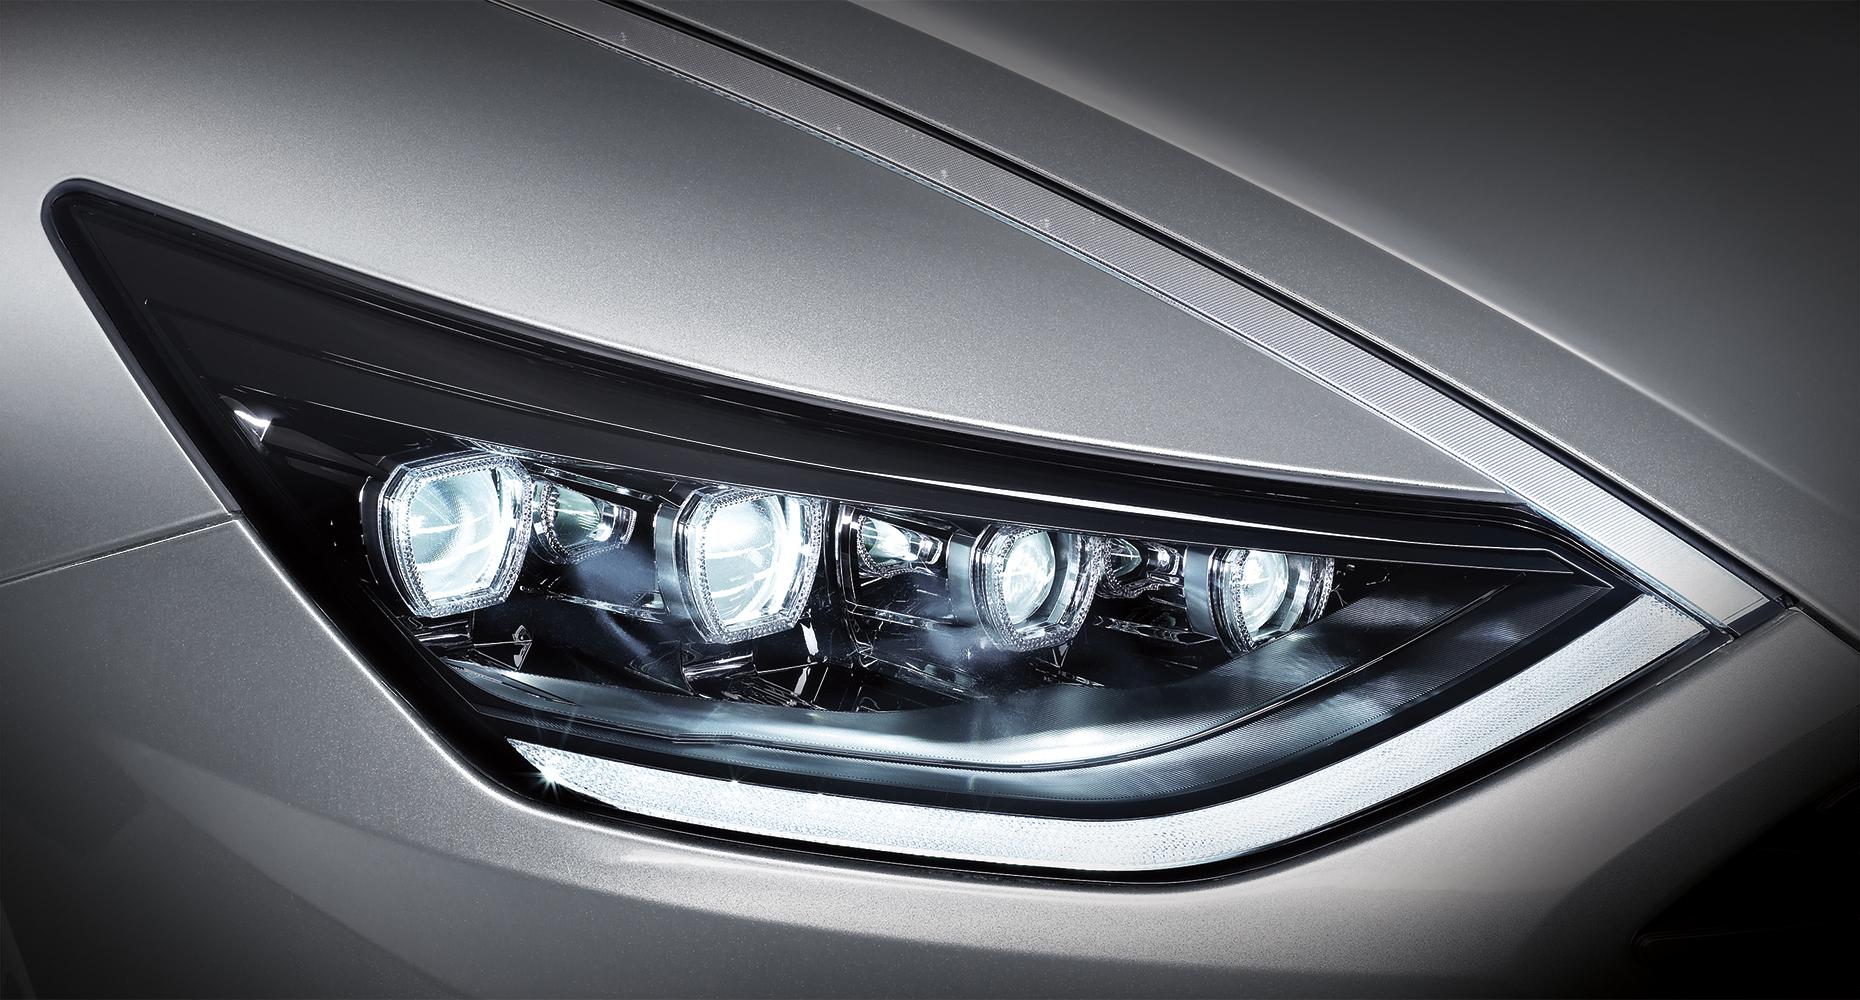 2020 Hyundai Sonata Features